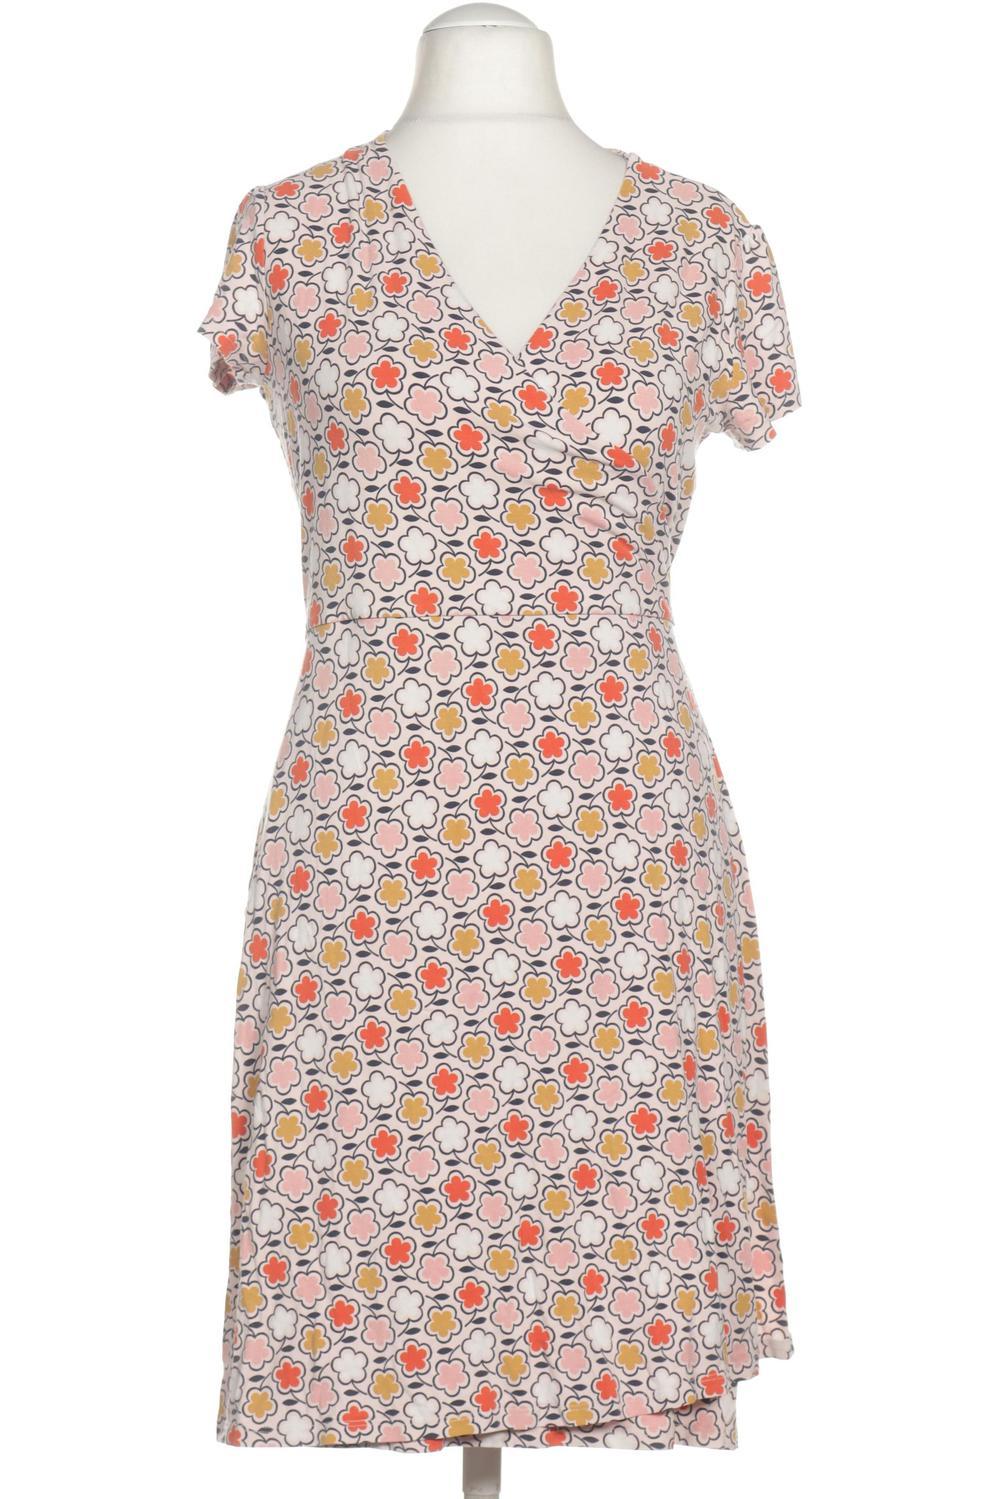 Boden Damen Kleid DE 19 Second Hand kaufen  ubup